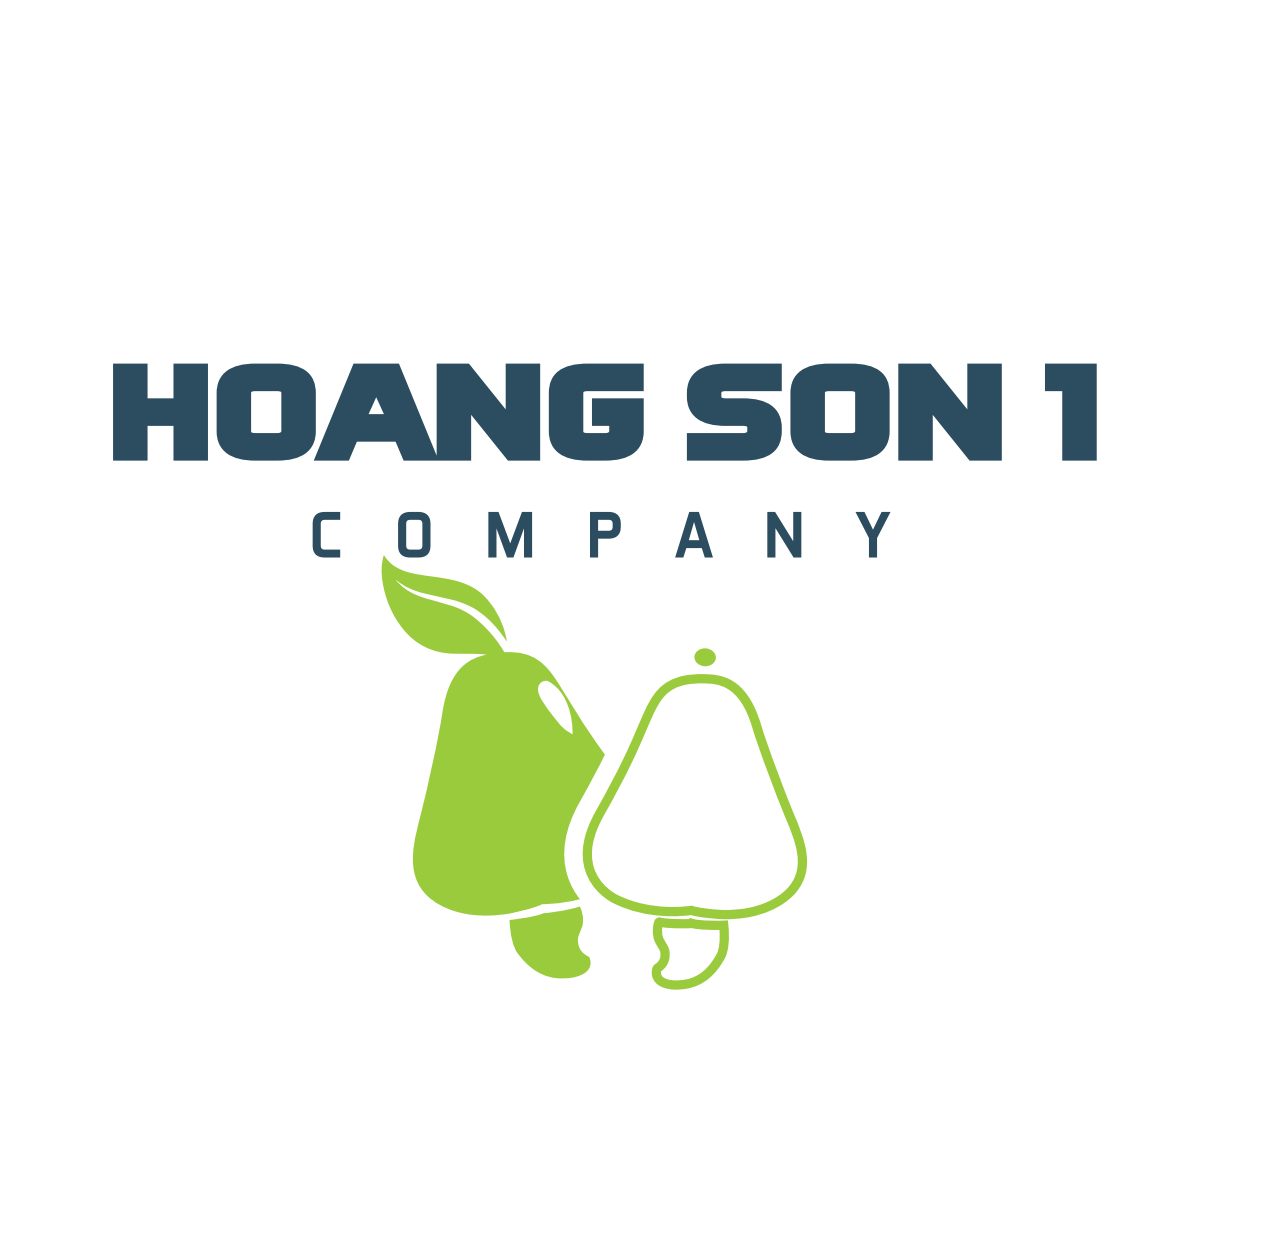 HOANGSON1_2017